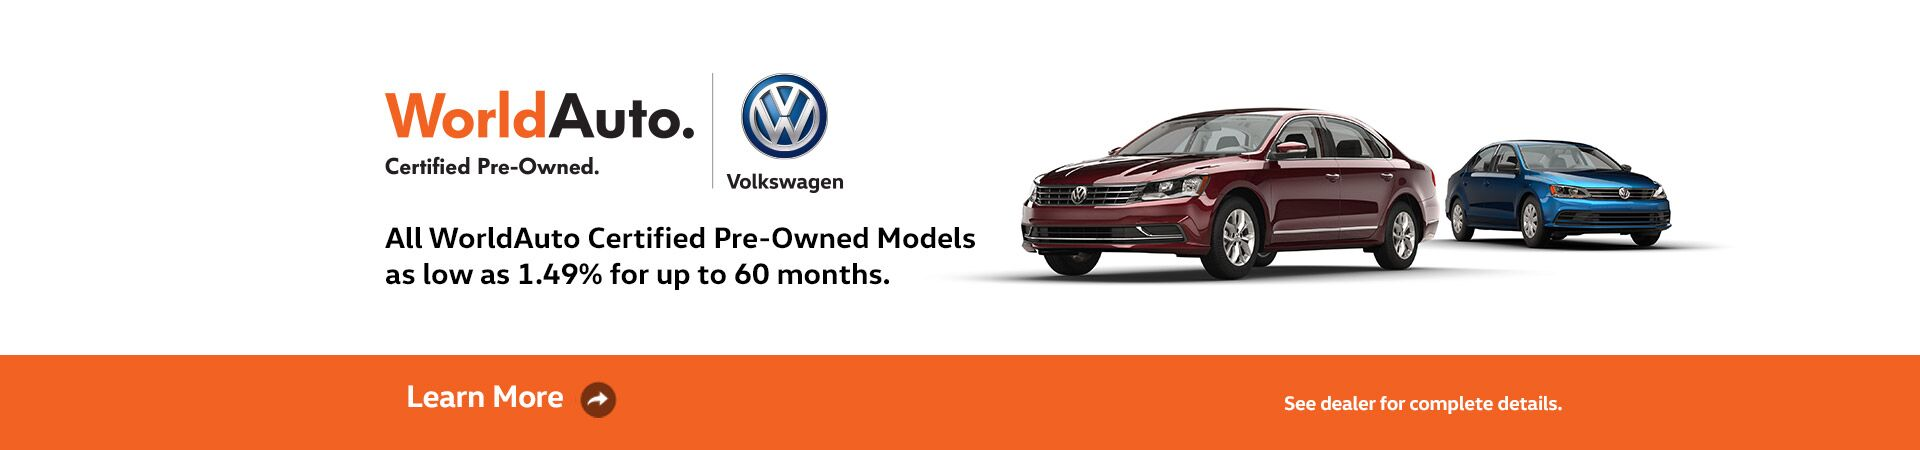 Volkswagen Dealership Pittsburgh Pa Used Cars Three Rivers